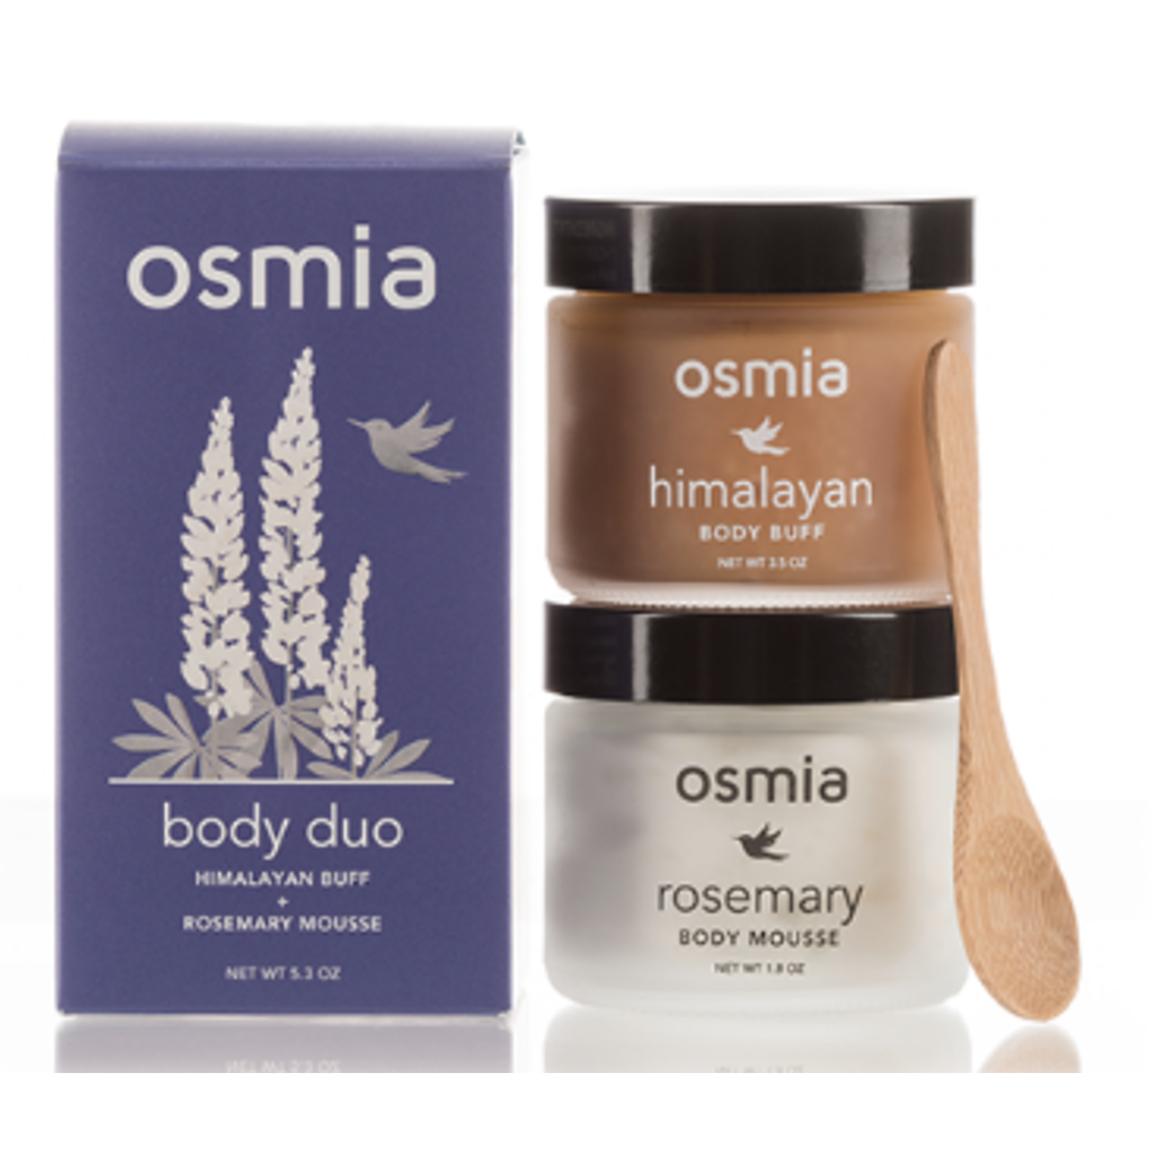 Osmia Body Duo